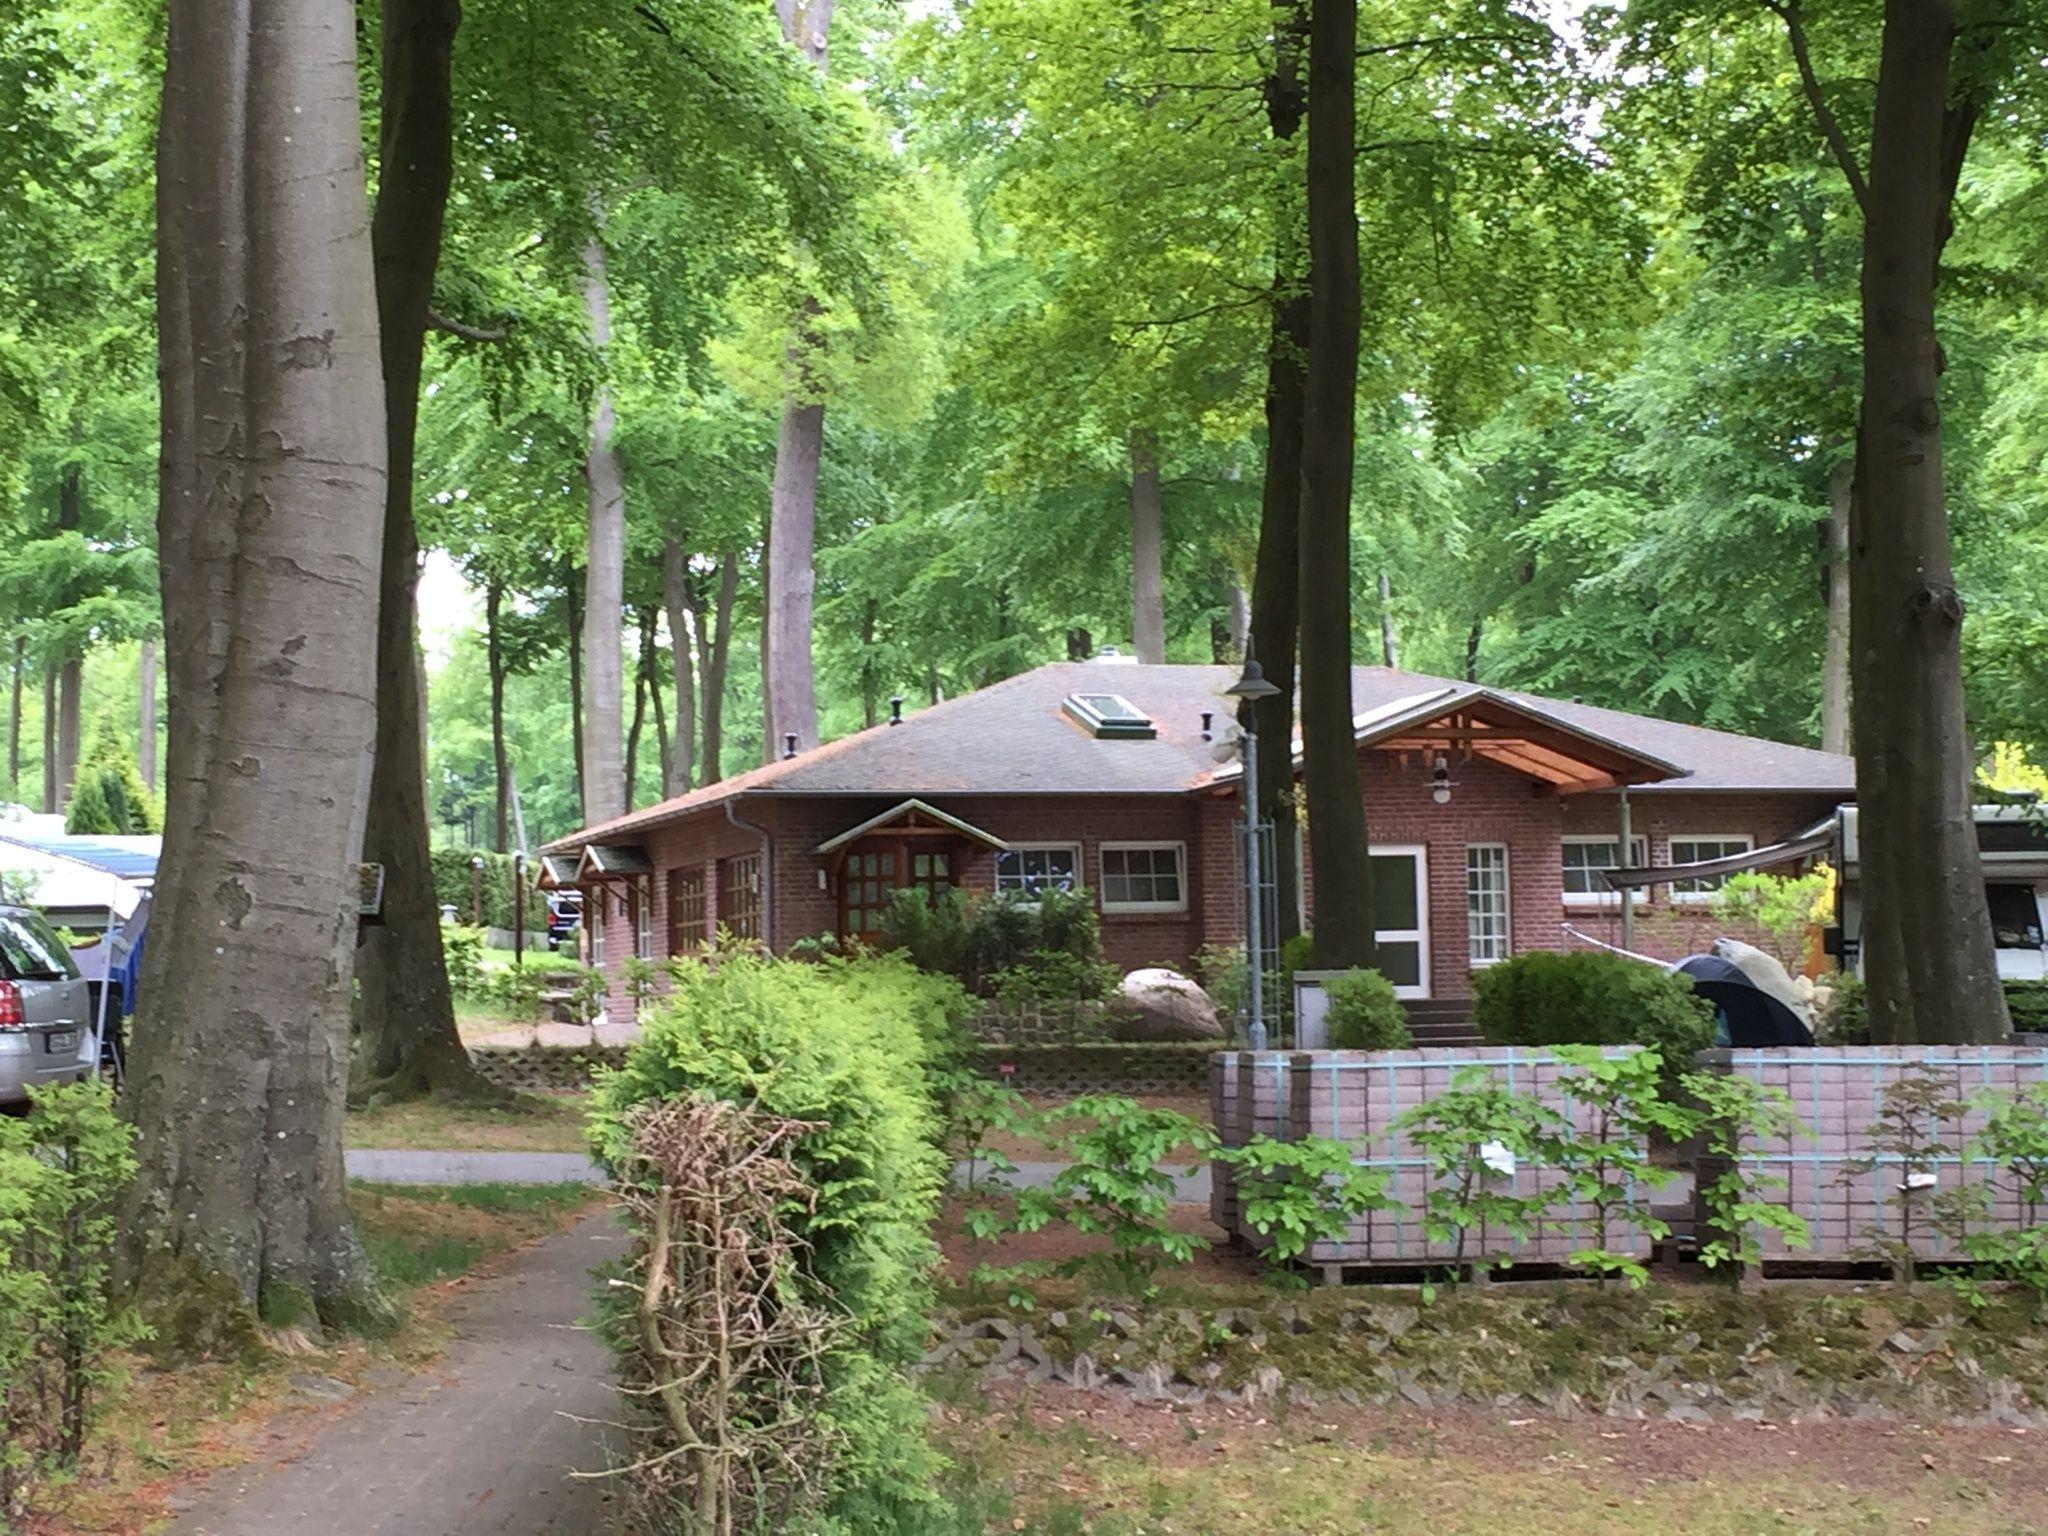 Campingplatz auf Usedom, Ückeritz. 😎 Campingplatz